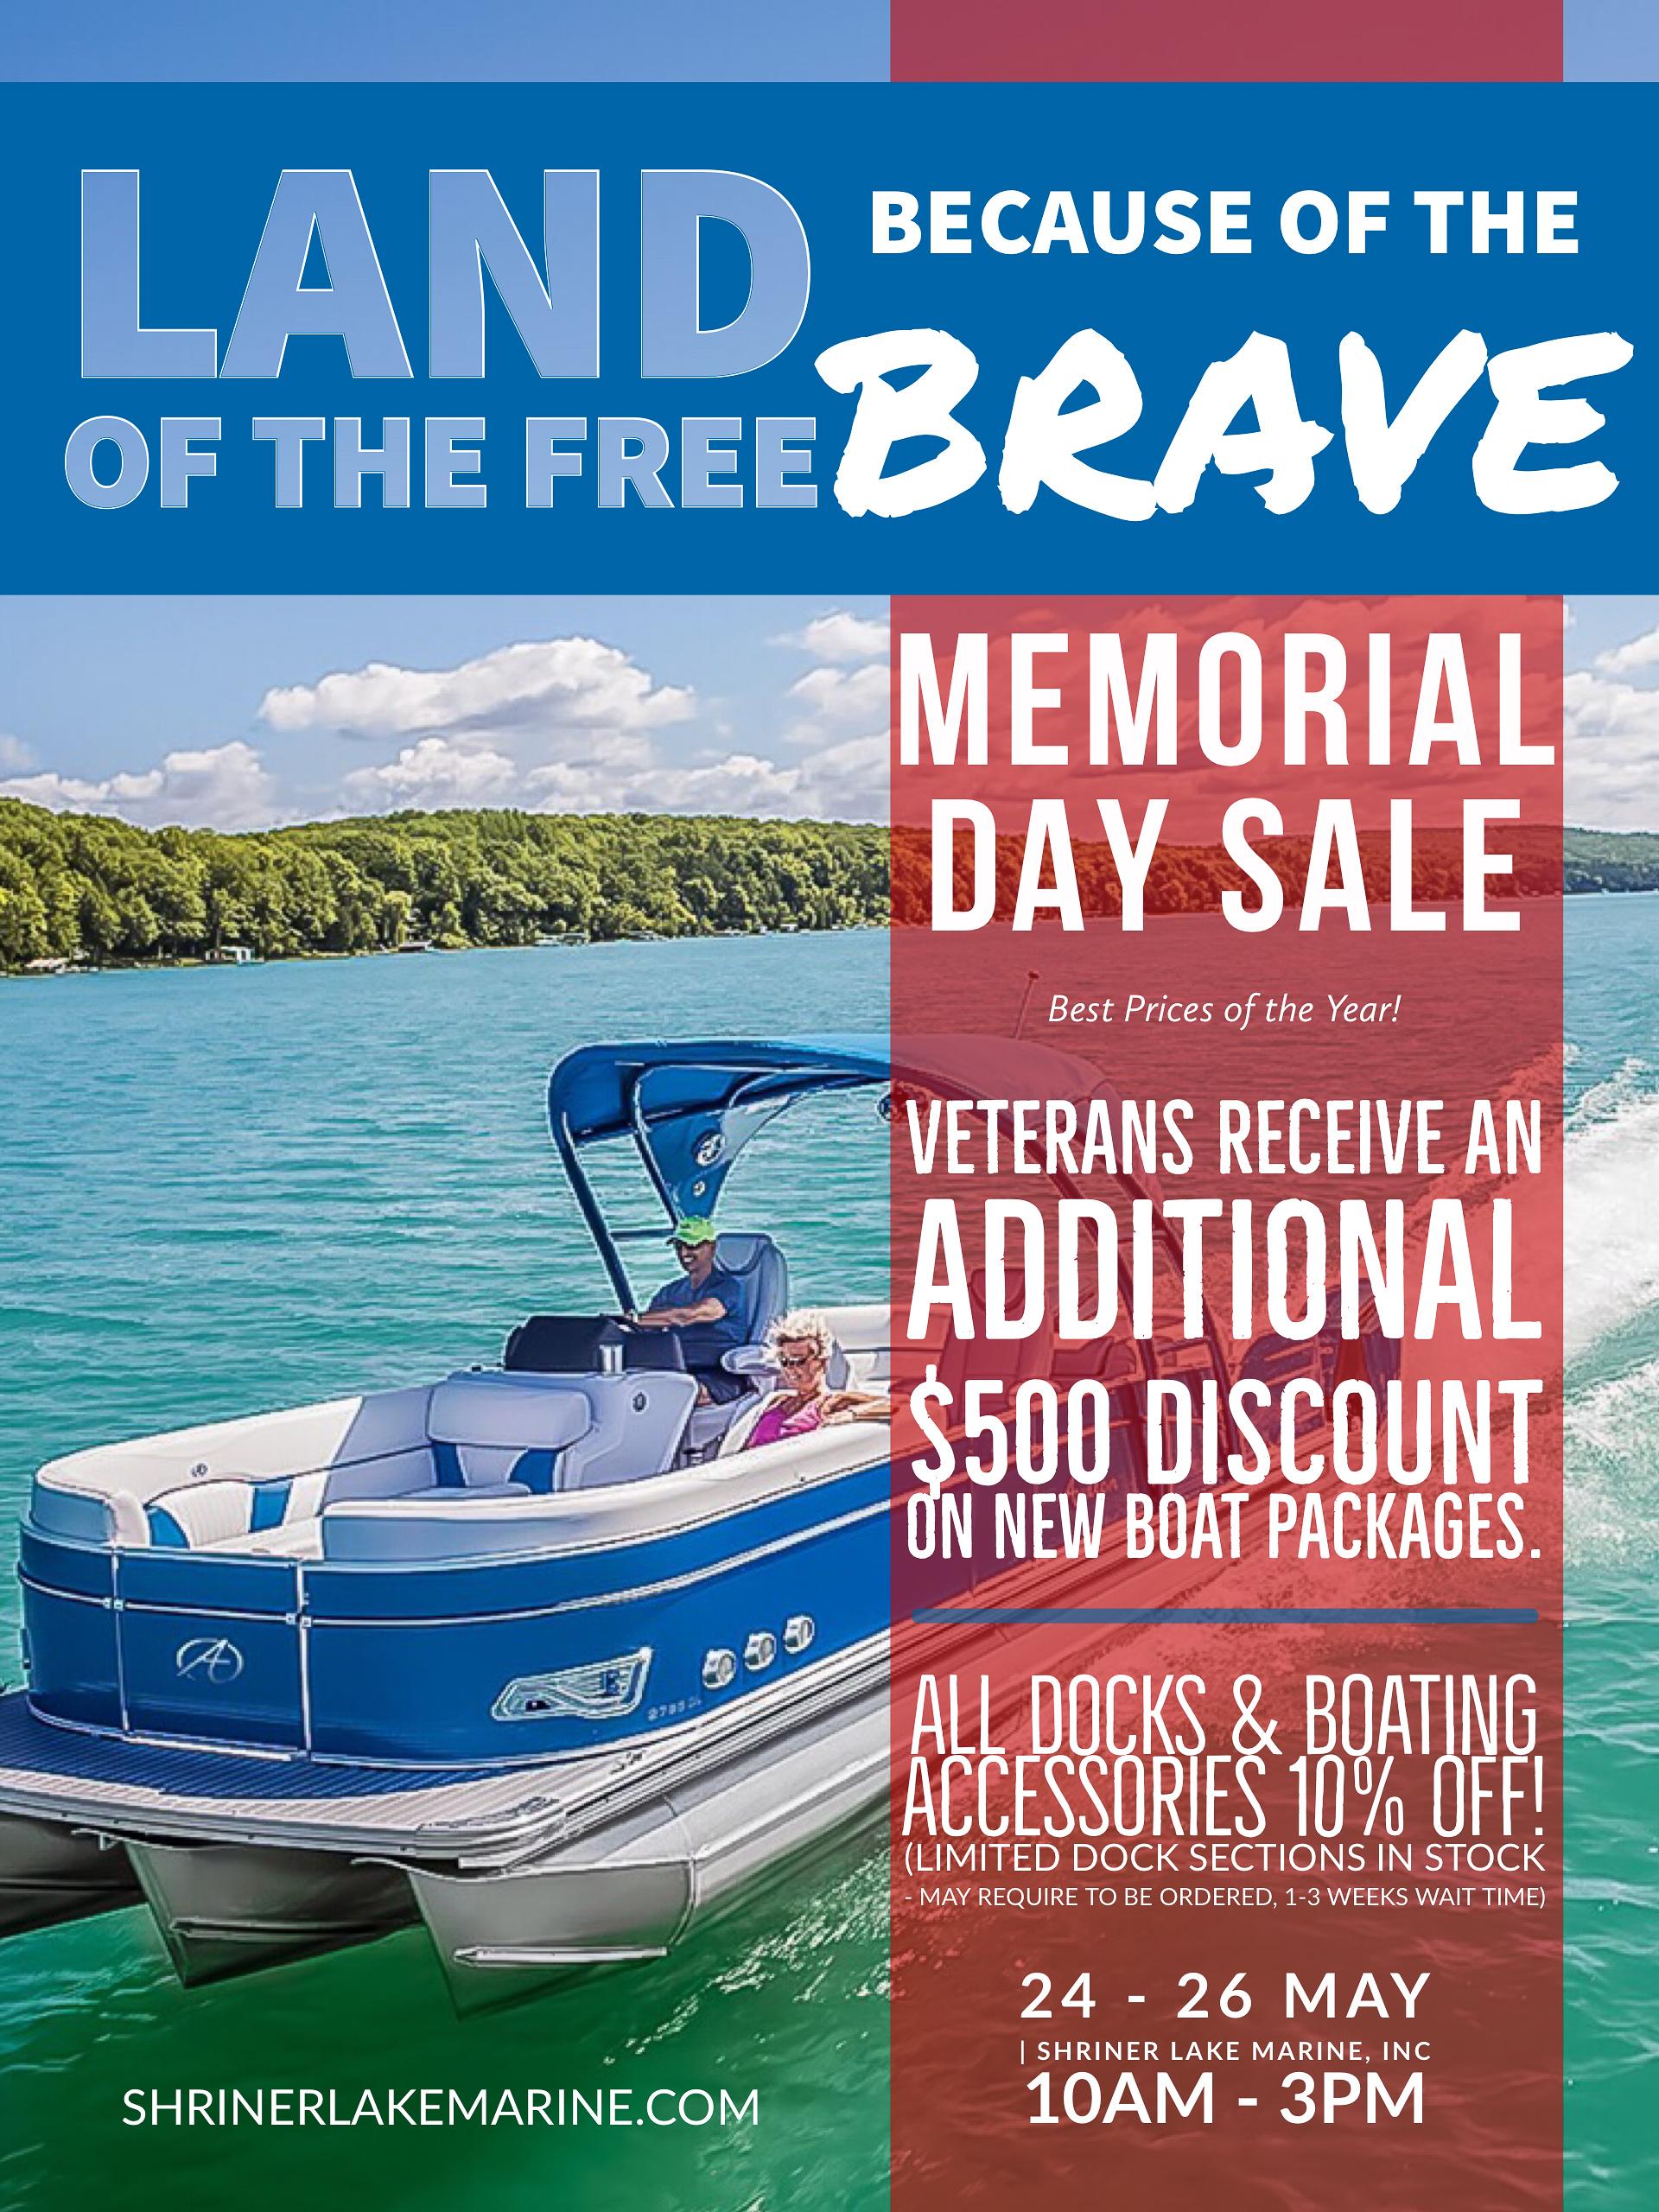 Shriner Lake Marine Memorial Day Boat Sale